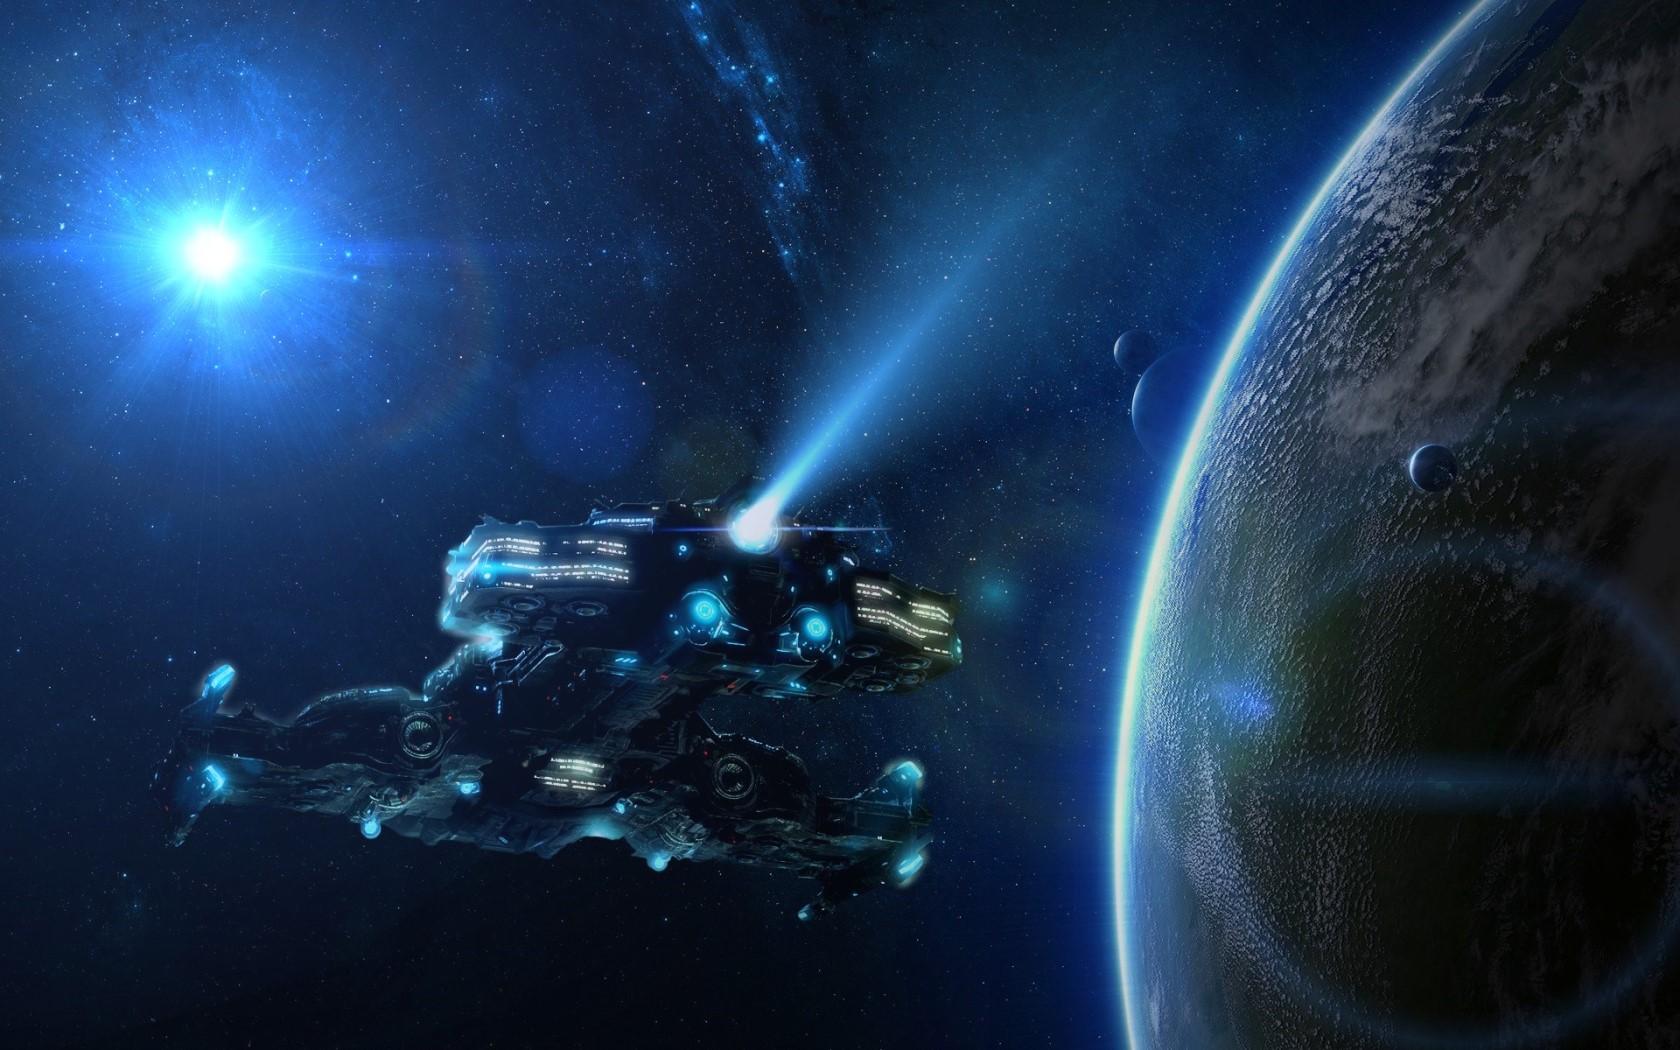 Battlecruiser v1 by cybercop71